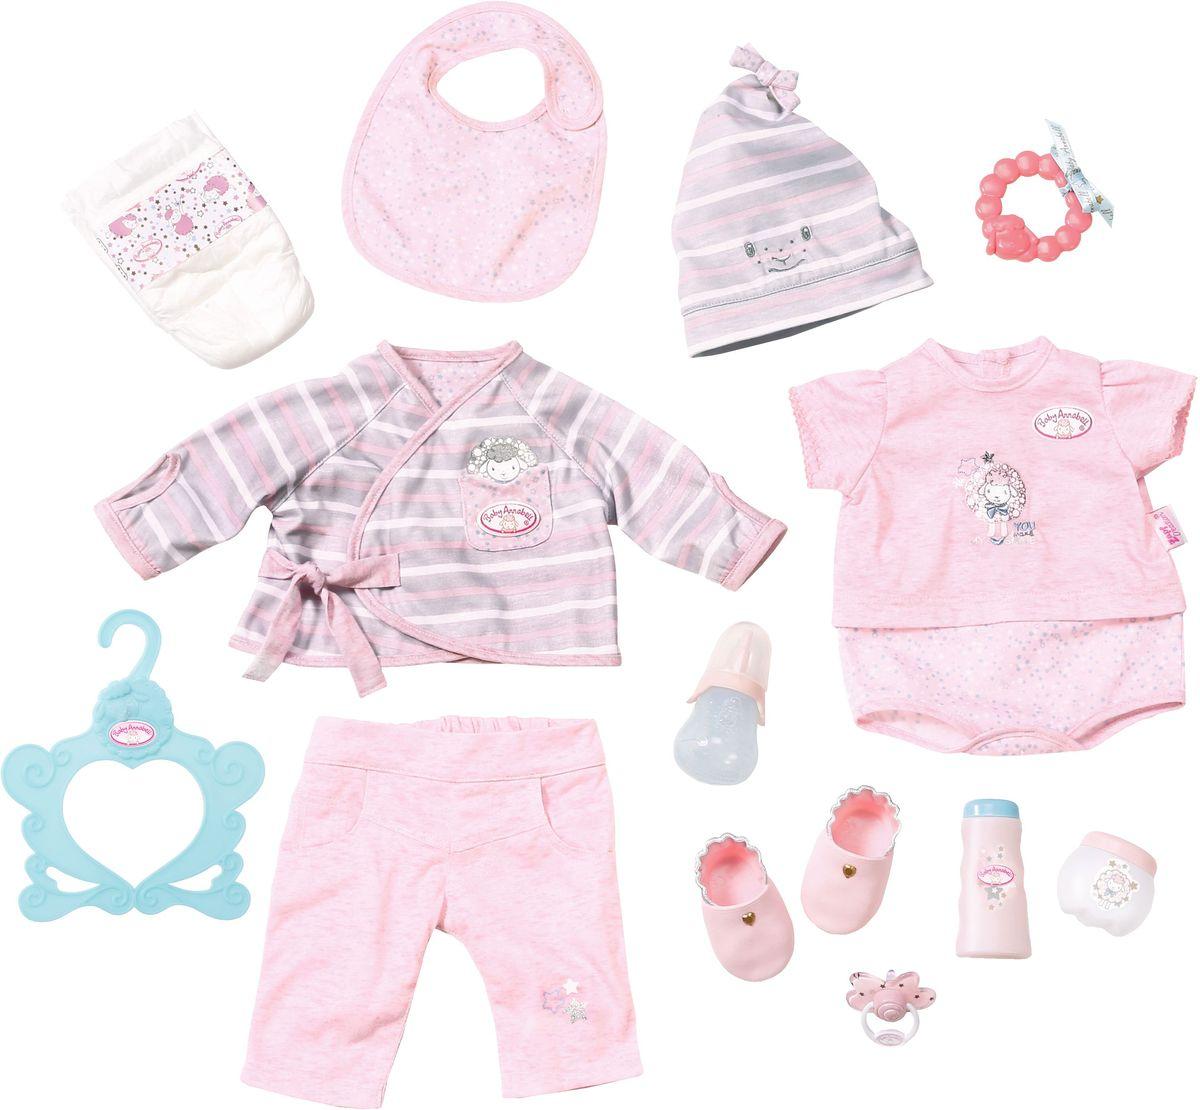 Baby Annabell Одежда для кукол с аксессуарами 700-181